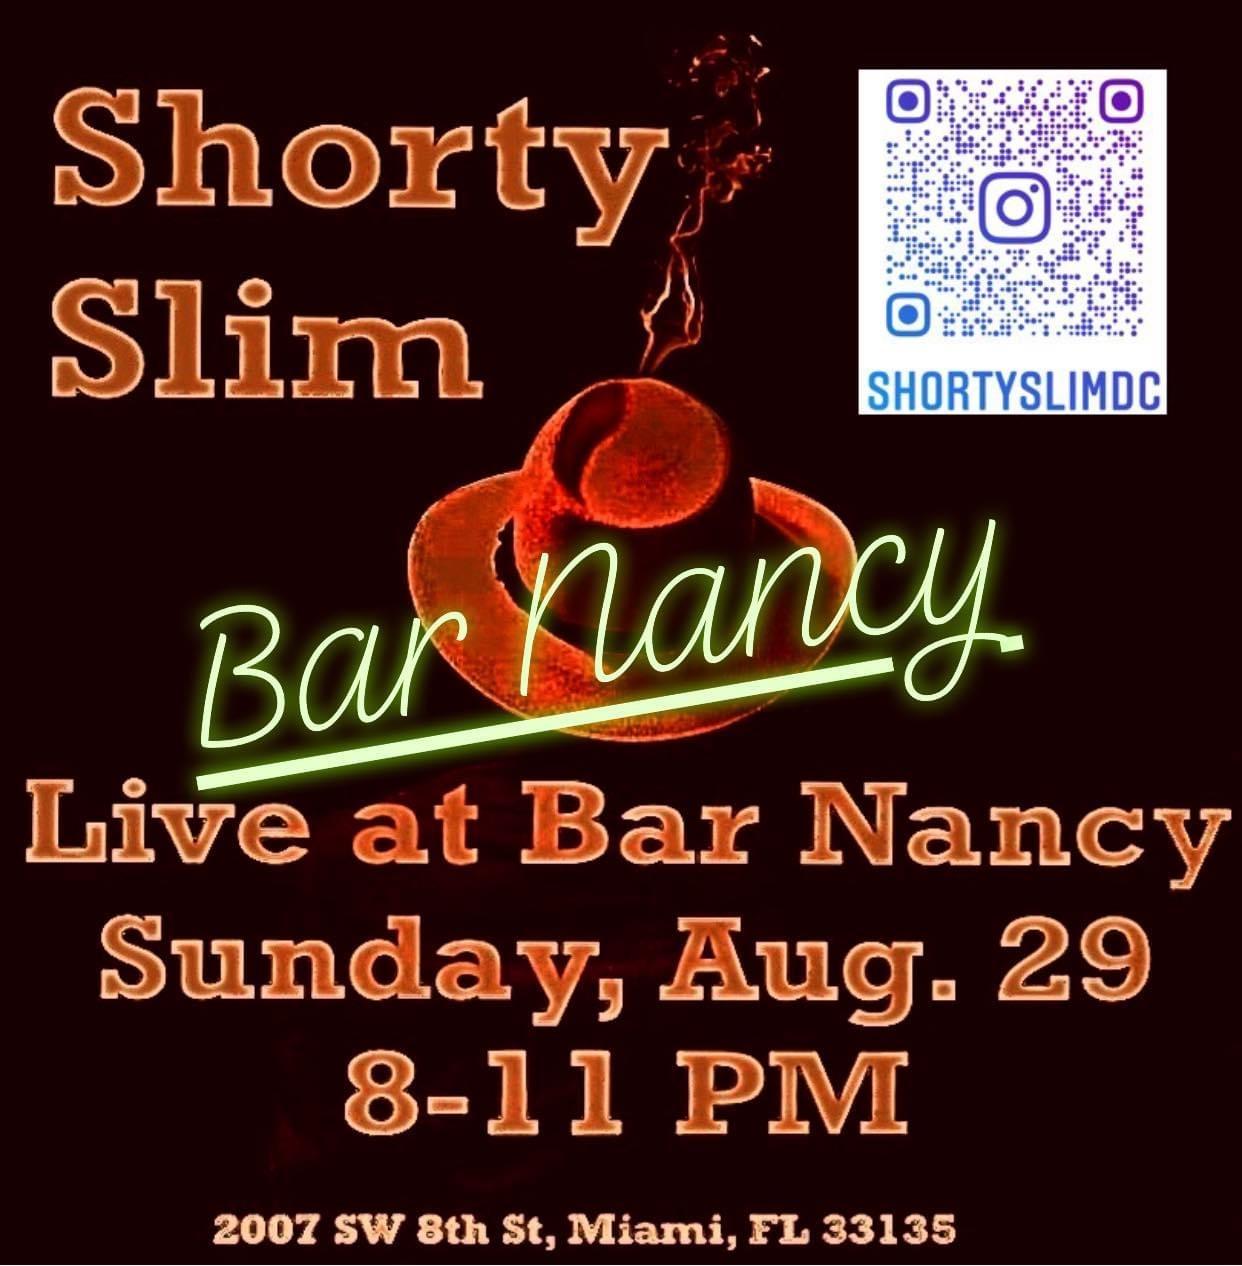 Shorty Slim at Bar Nancy 8PM August 29th